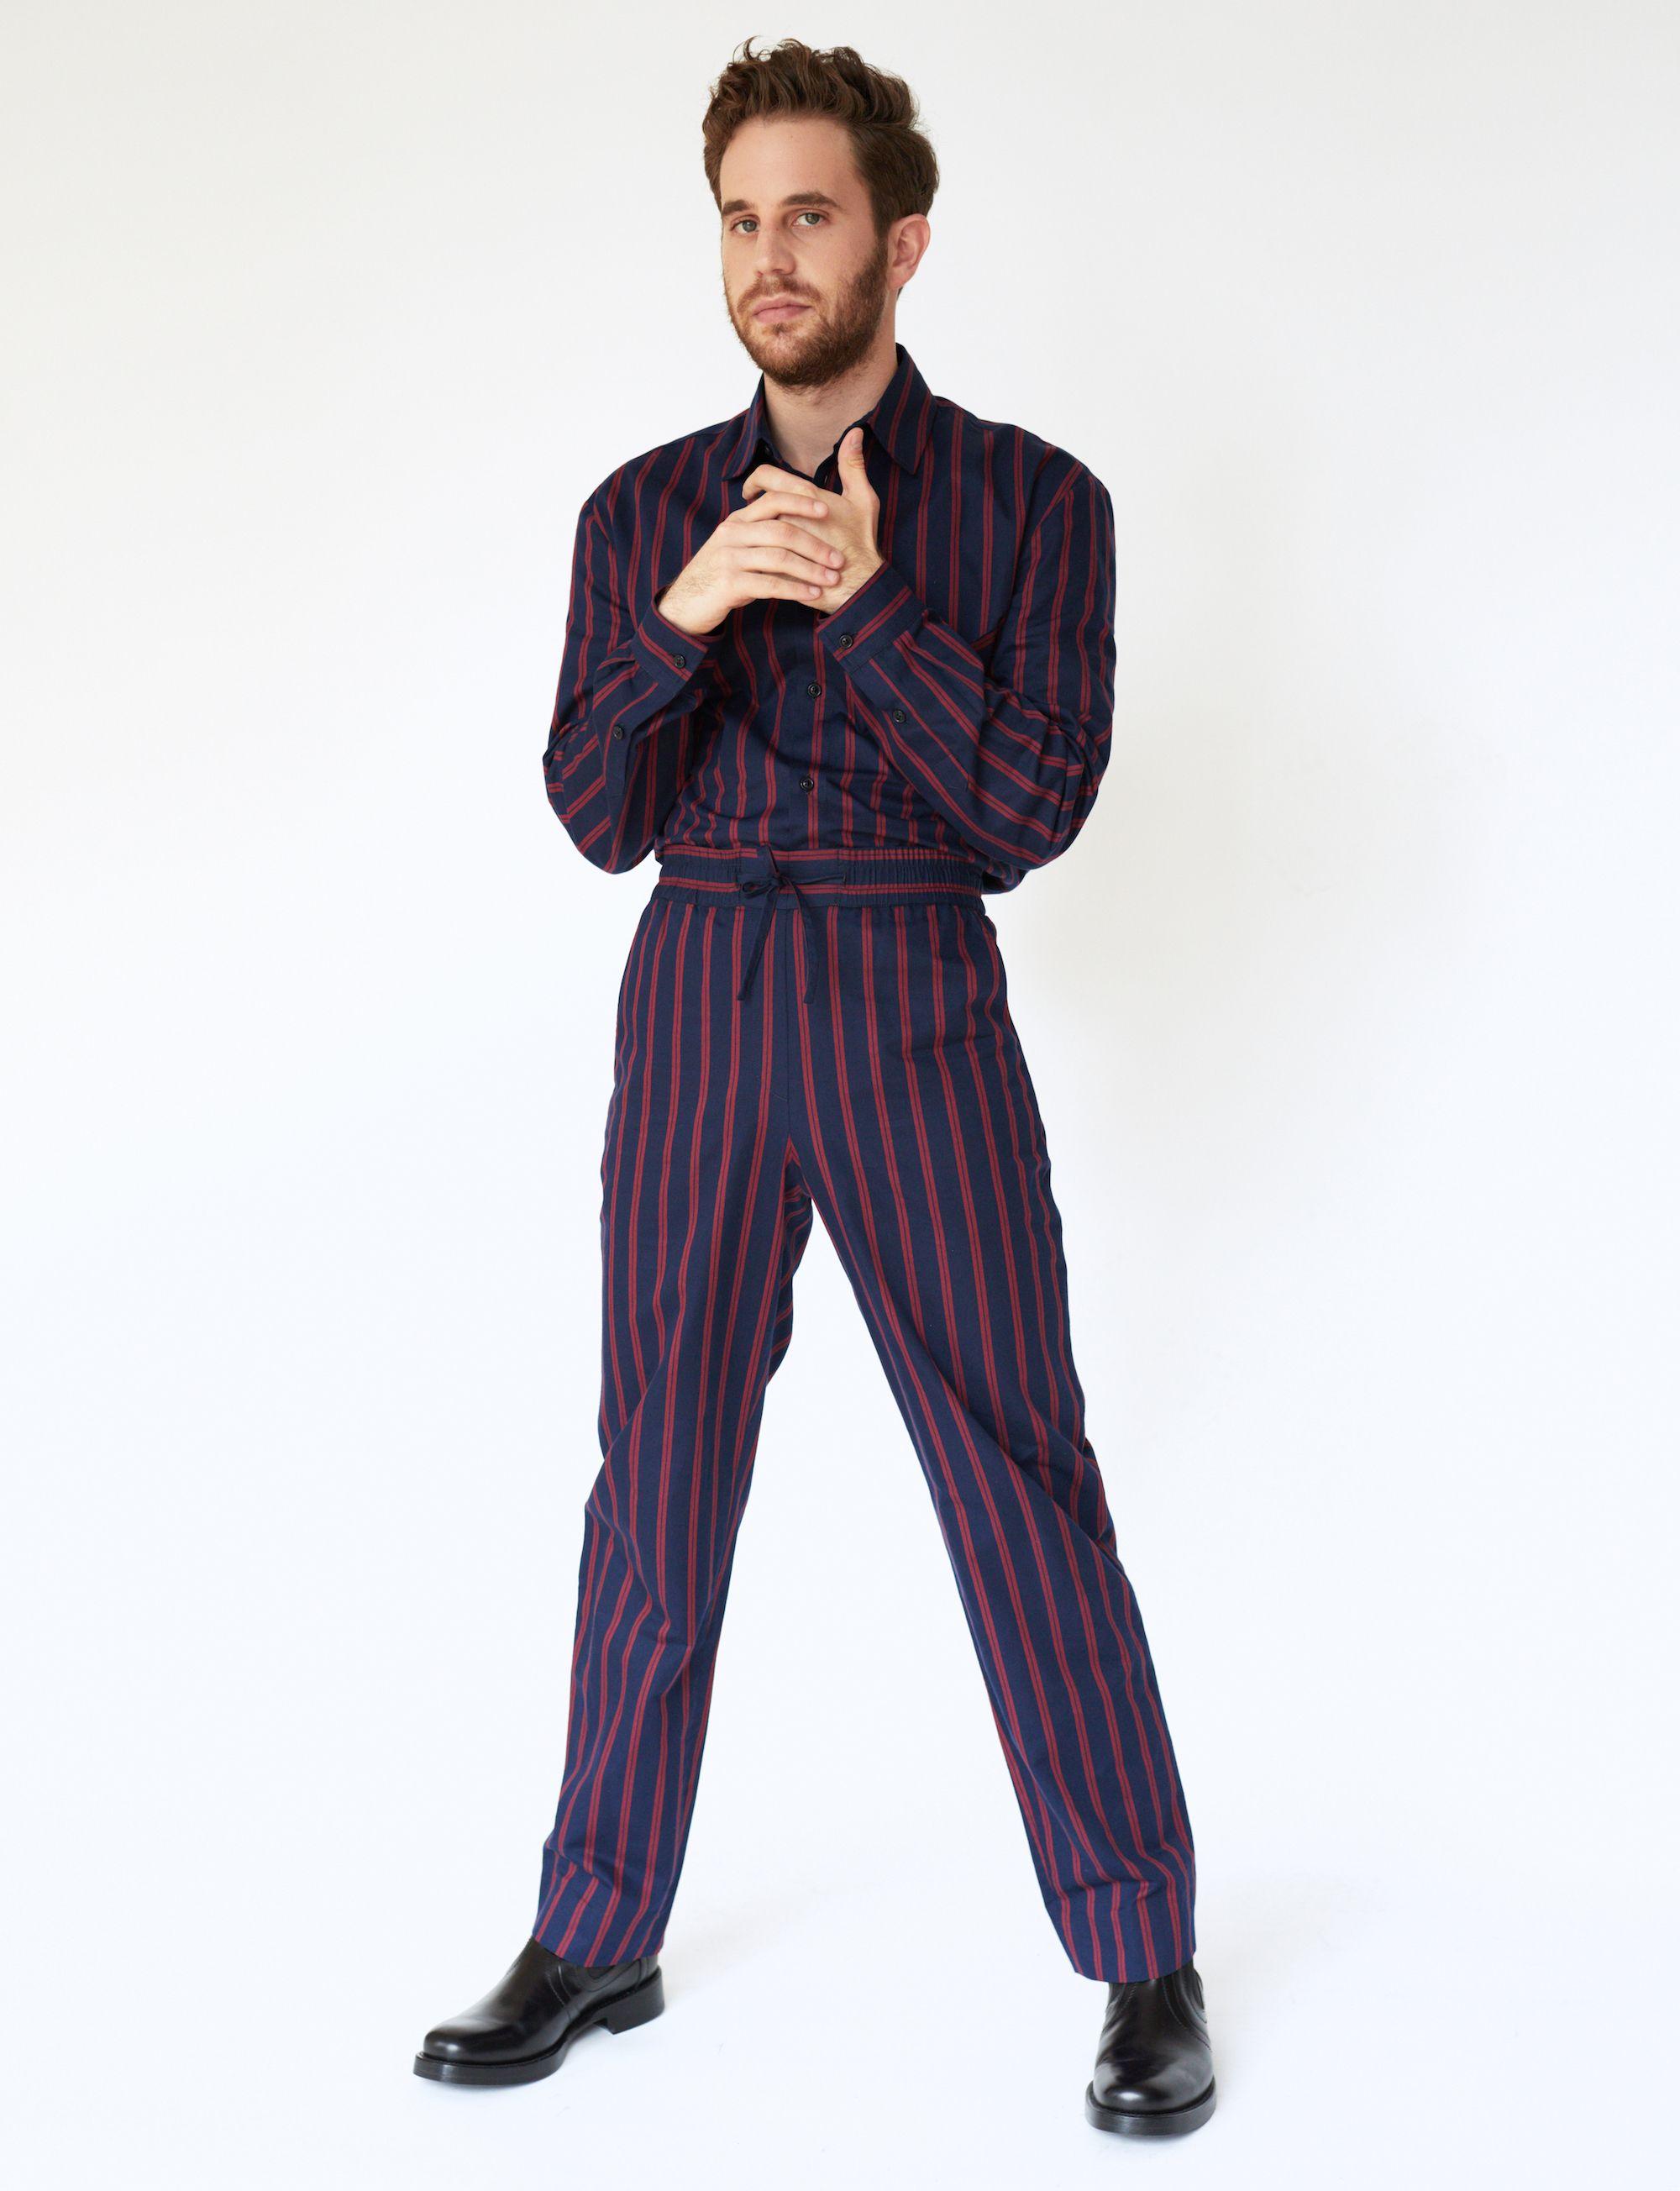 Pitch Perfect Star Ben Platt On Debut Solo Album Sing To Me Instead Ben Platt Pitch Perfect Dear Evan Hansen Broadway